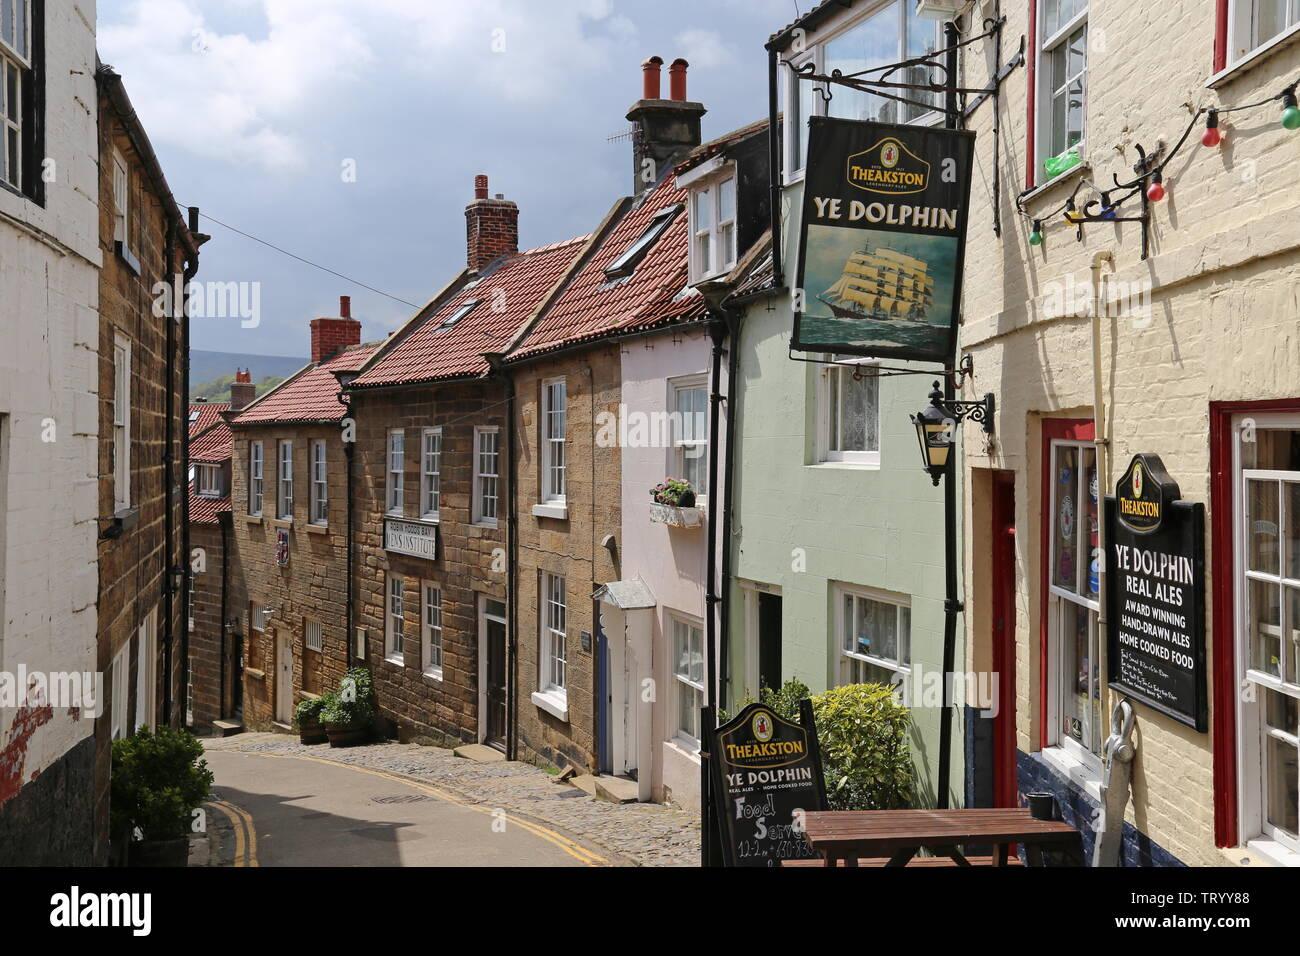 Ye Dolphin, King Street, Robin Hood's Bay, Borough of Scarborough, North Yorkshire, England, Great Britain, United Kingdom, UK, Europe Stock Photo